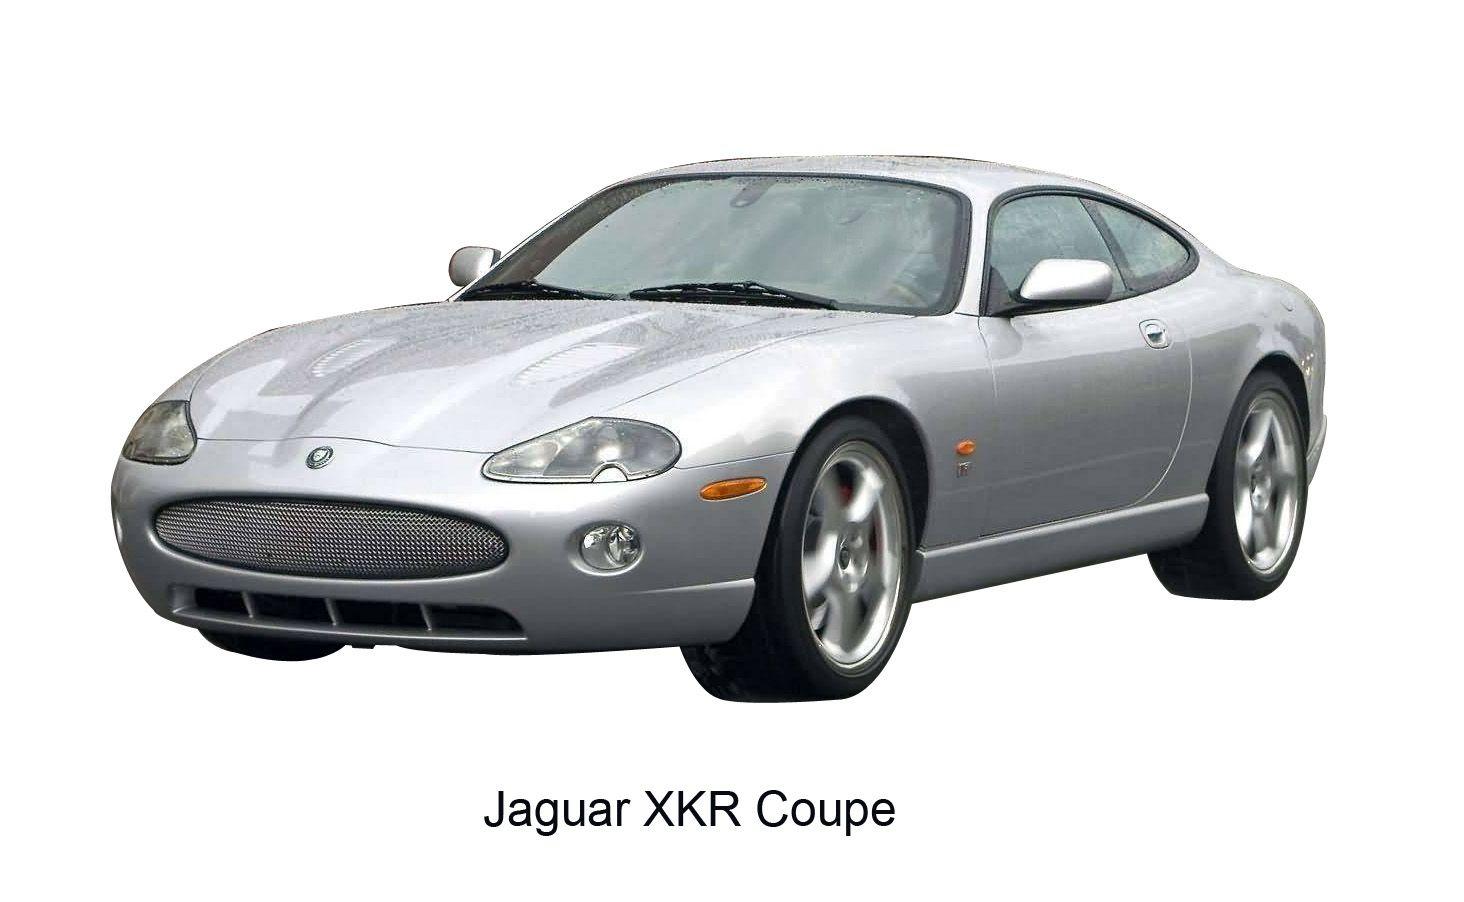 Jaguar Offers Best Price on Jaguar XKR Coupe Car in